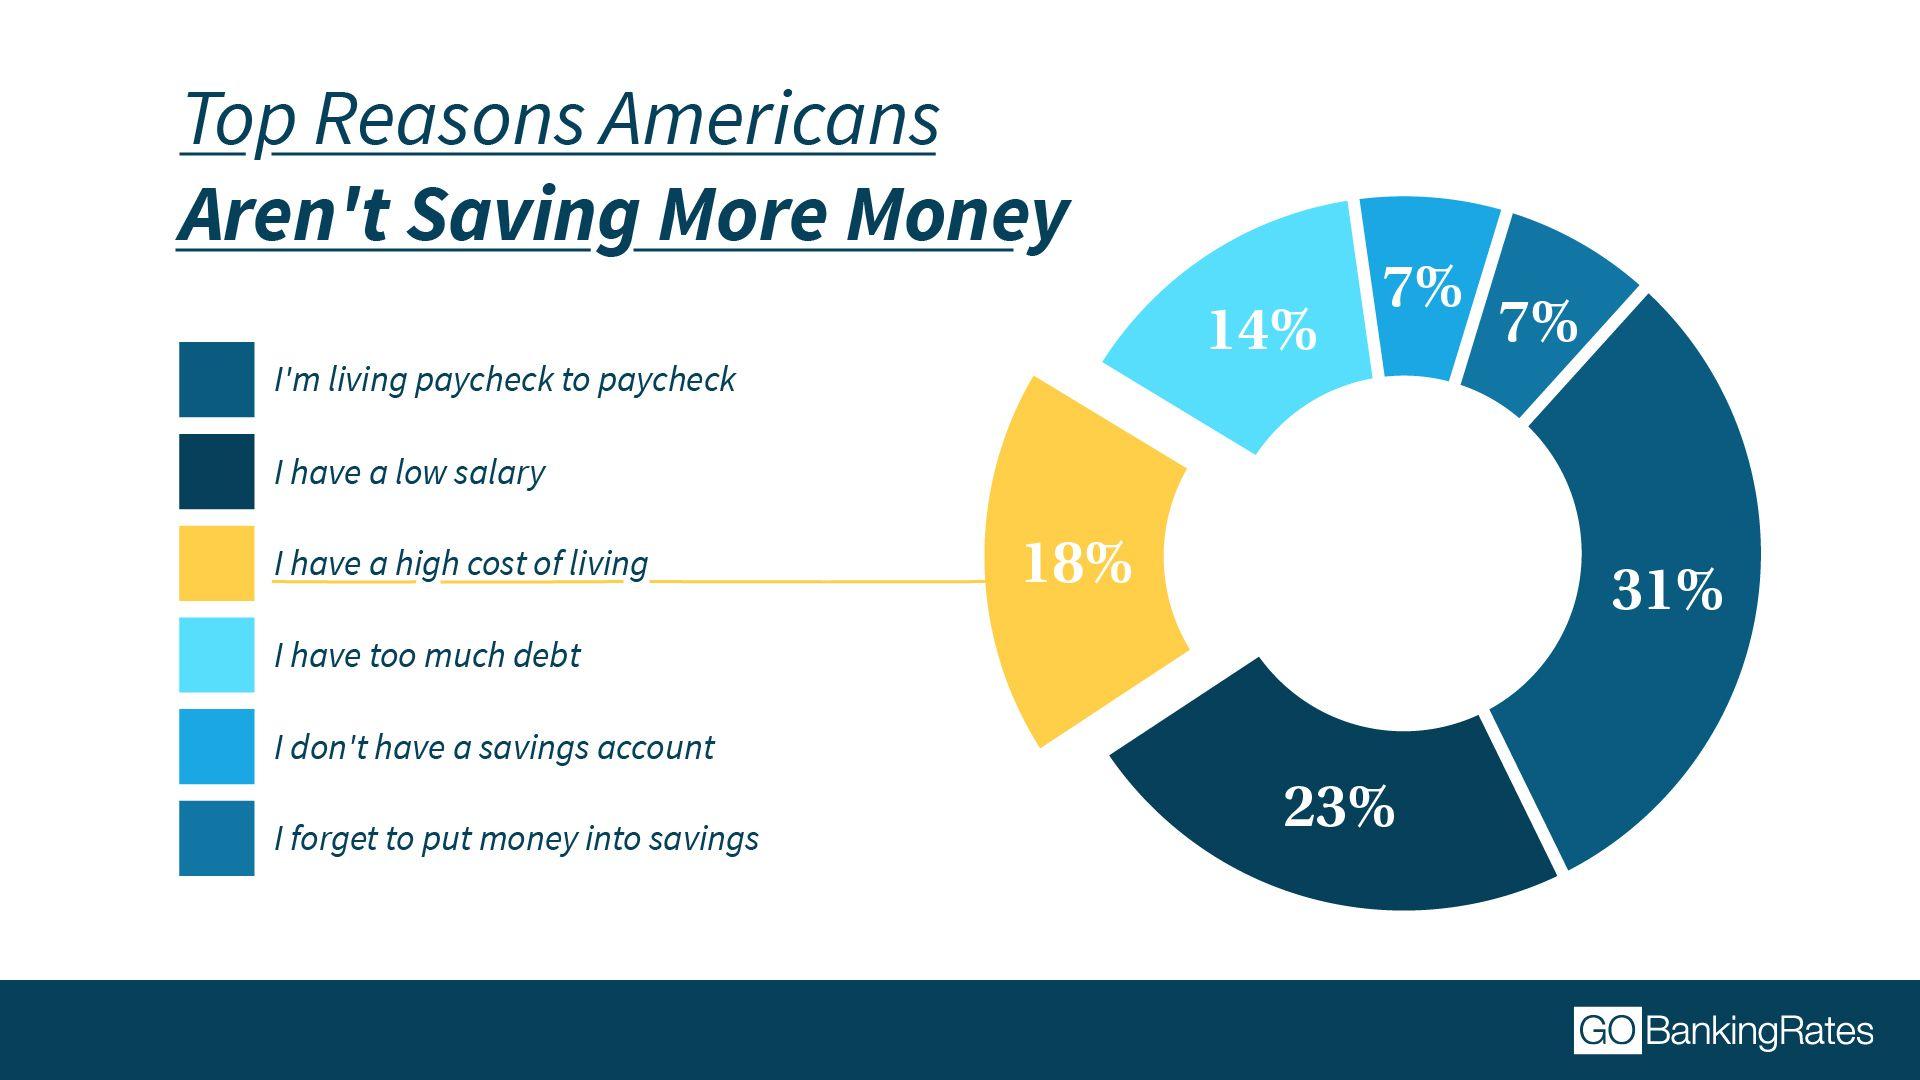 Americans savings habits